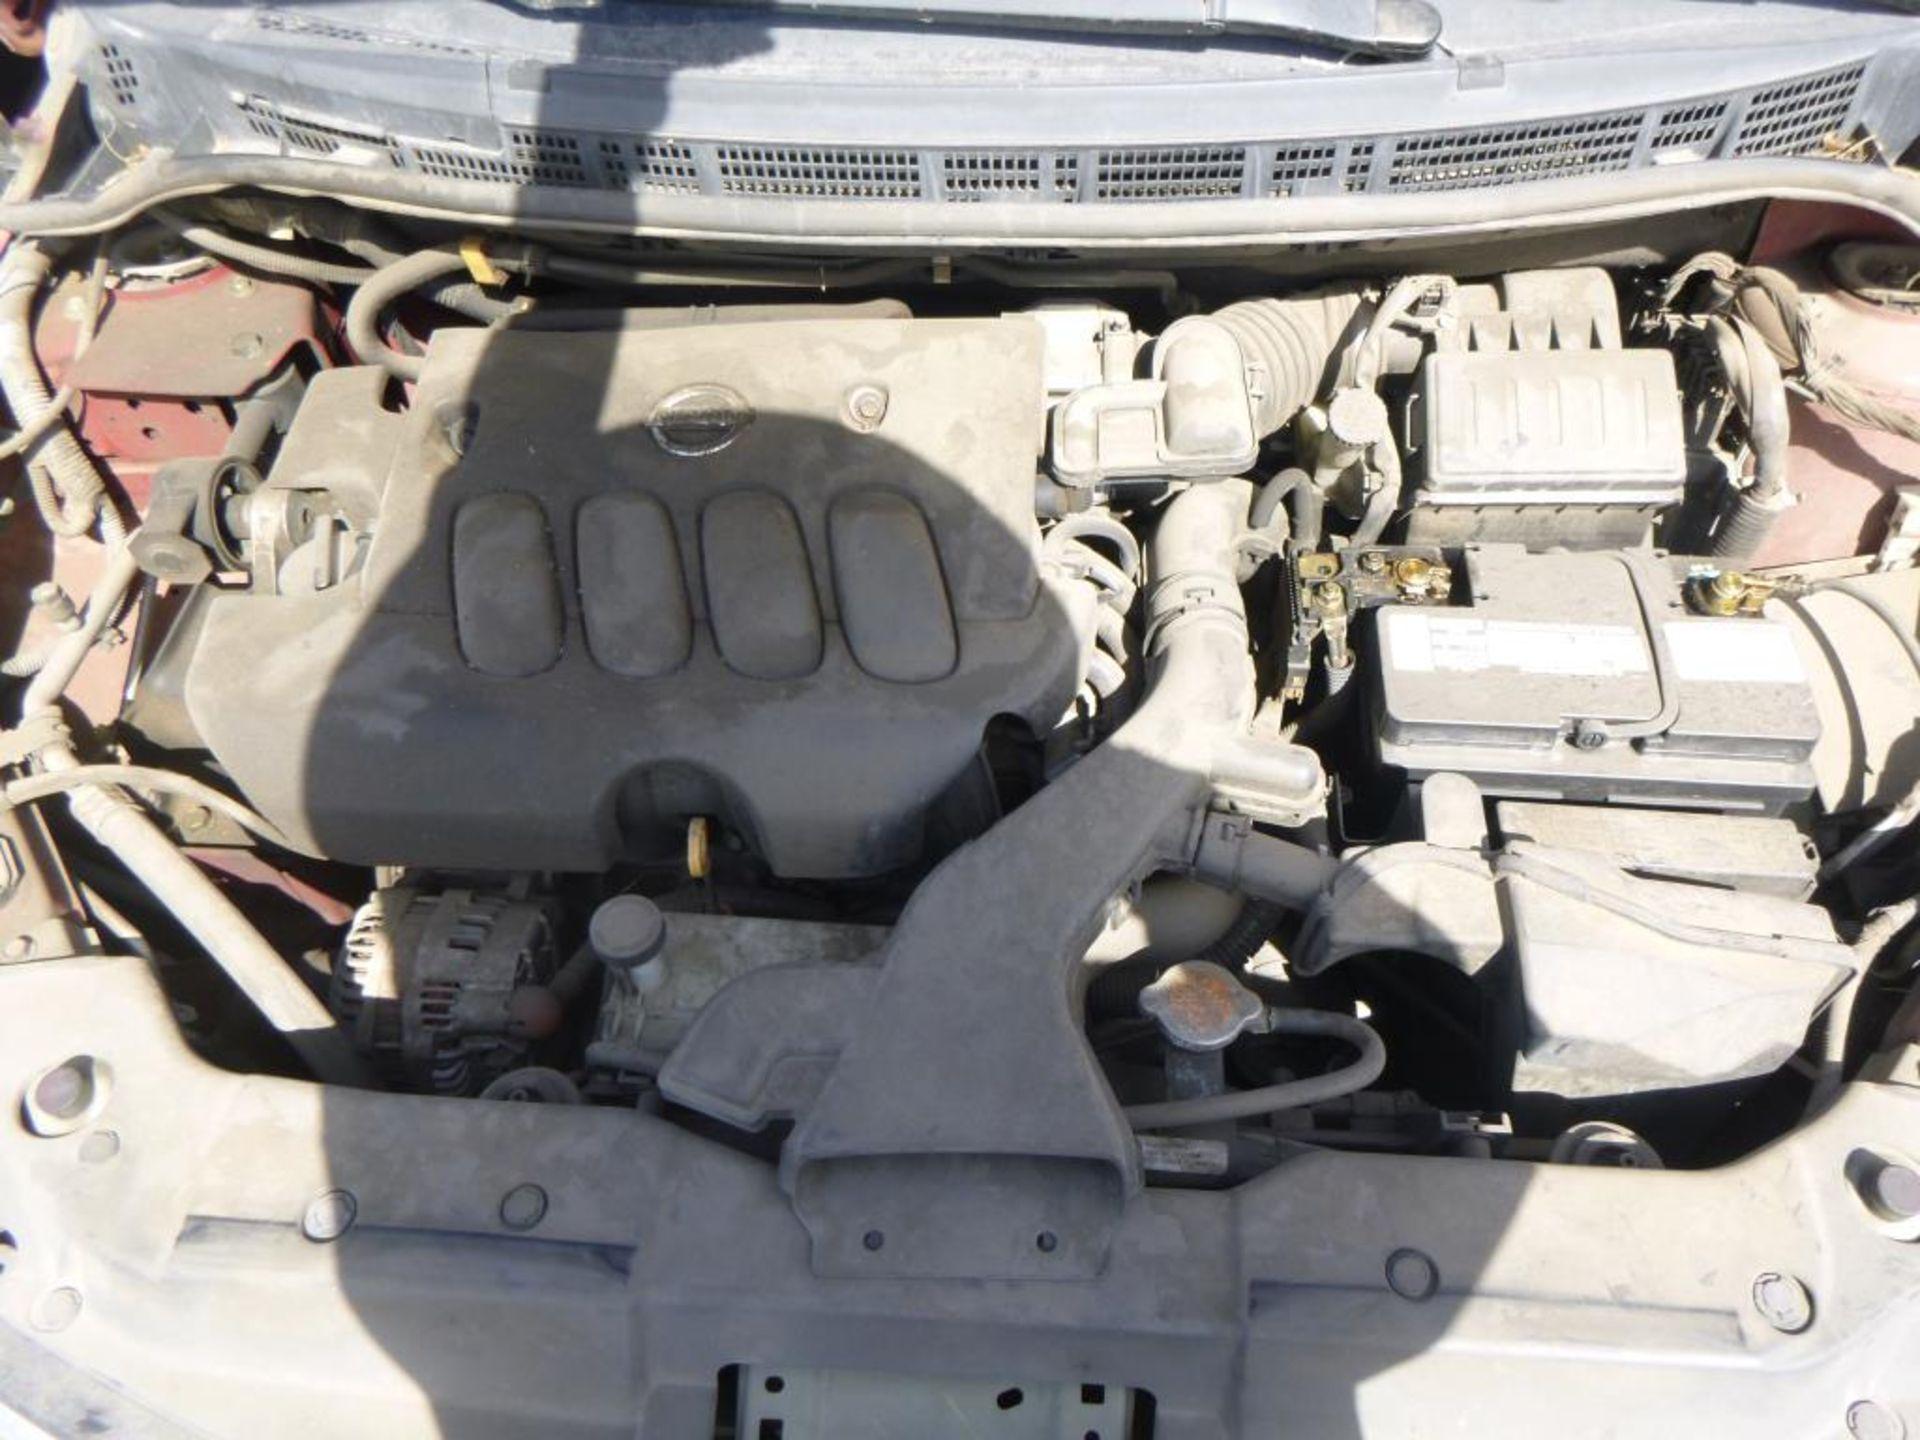 2010 Nissan Versa - Image 5 of 13